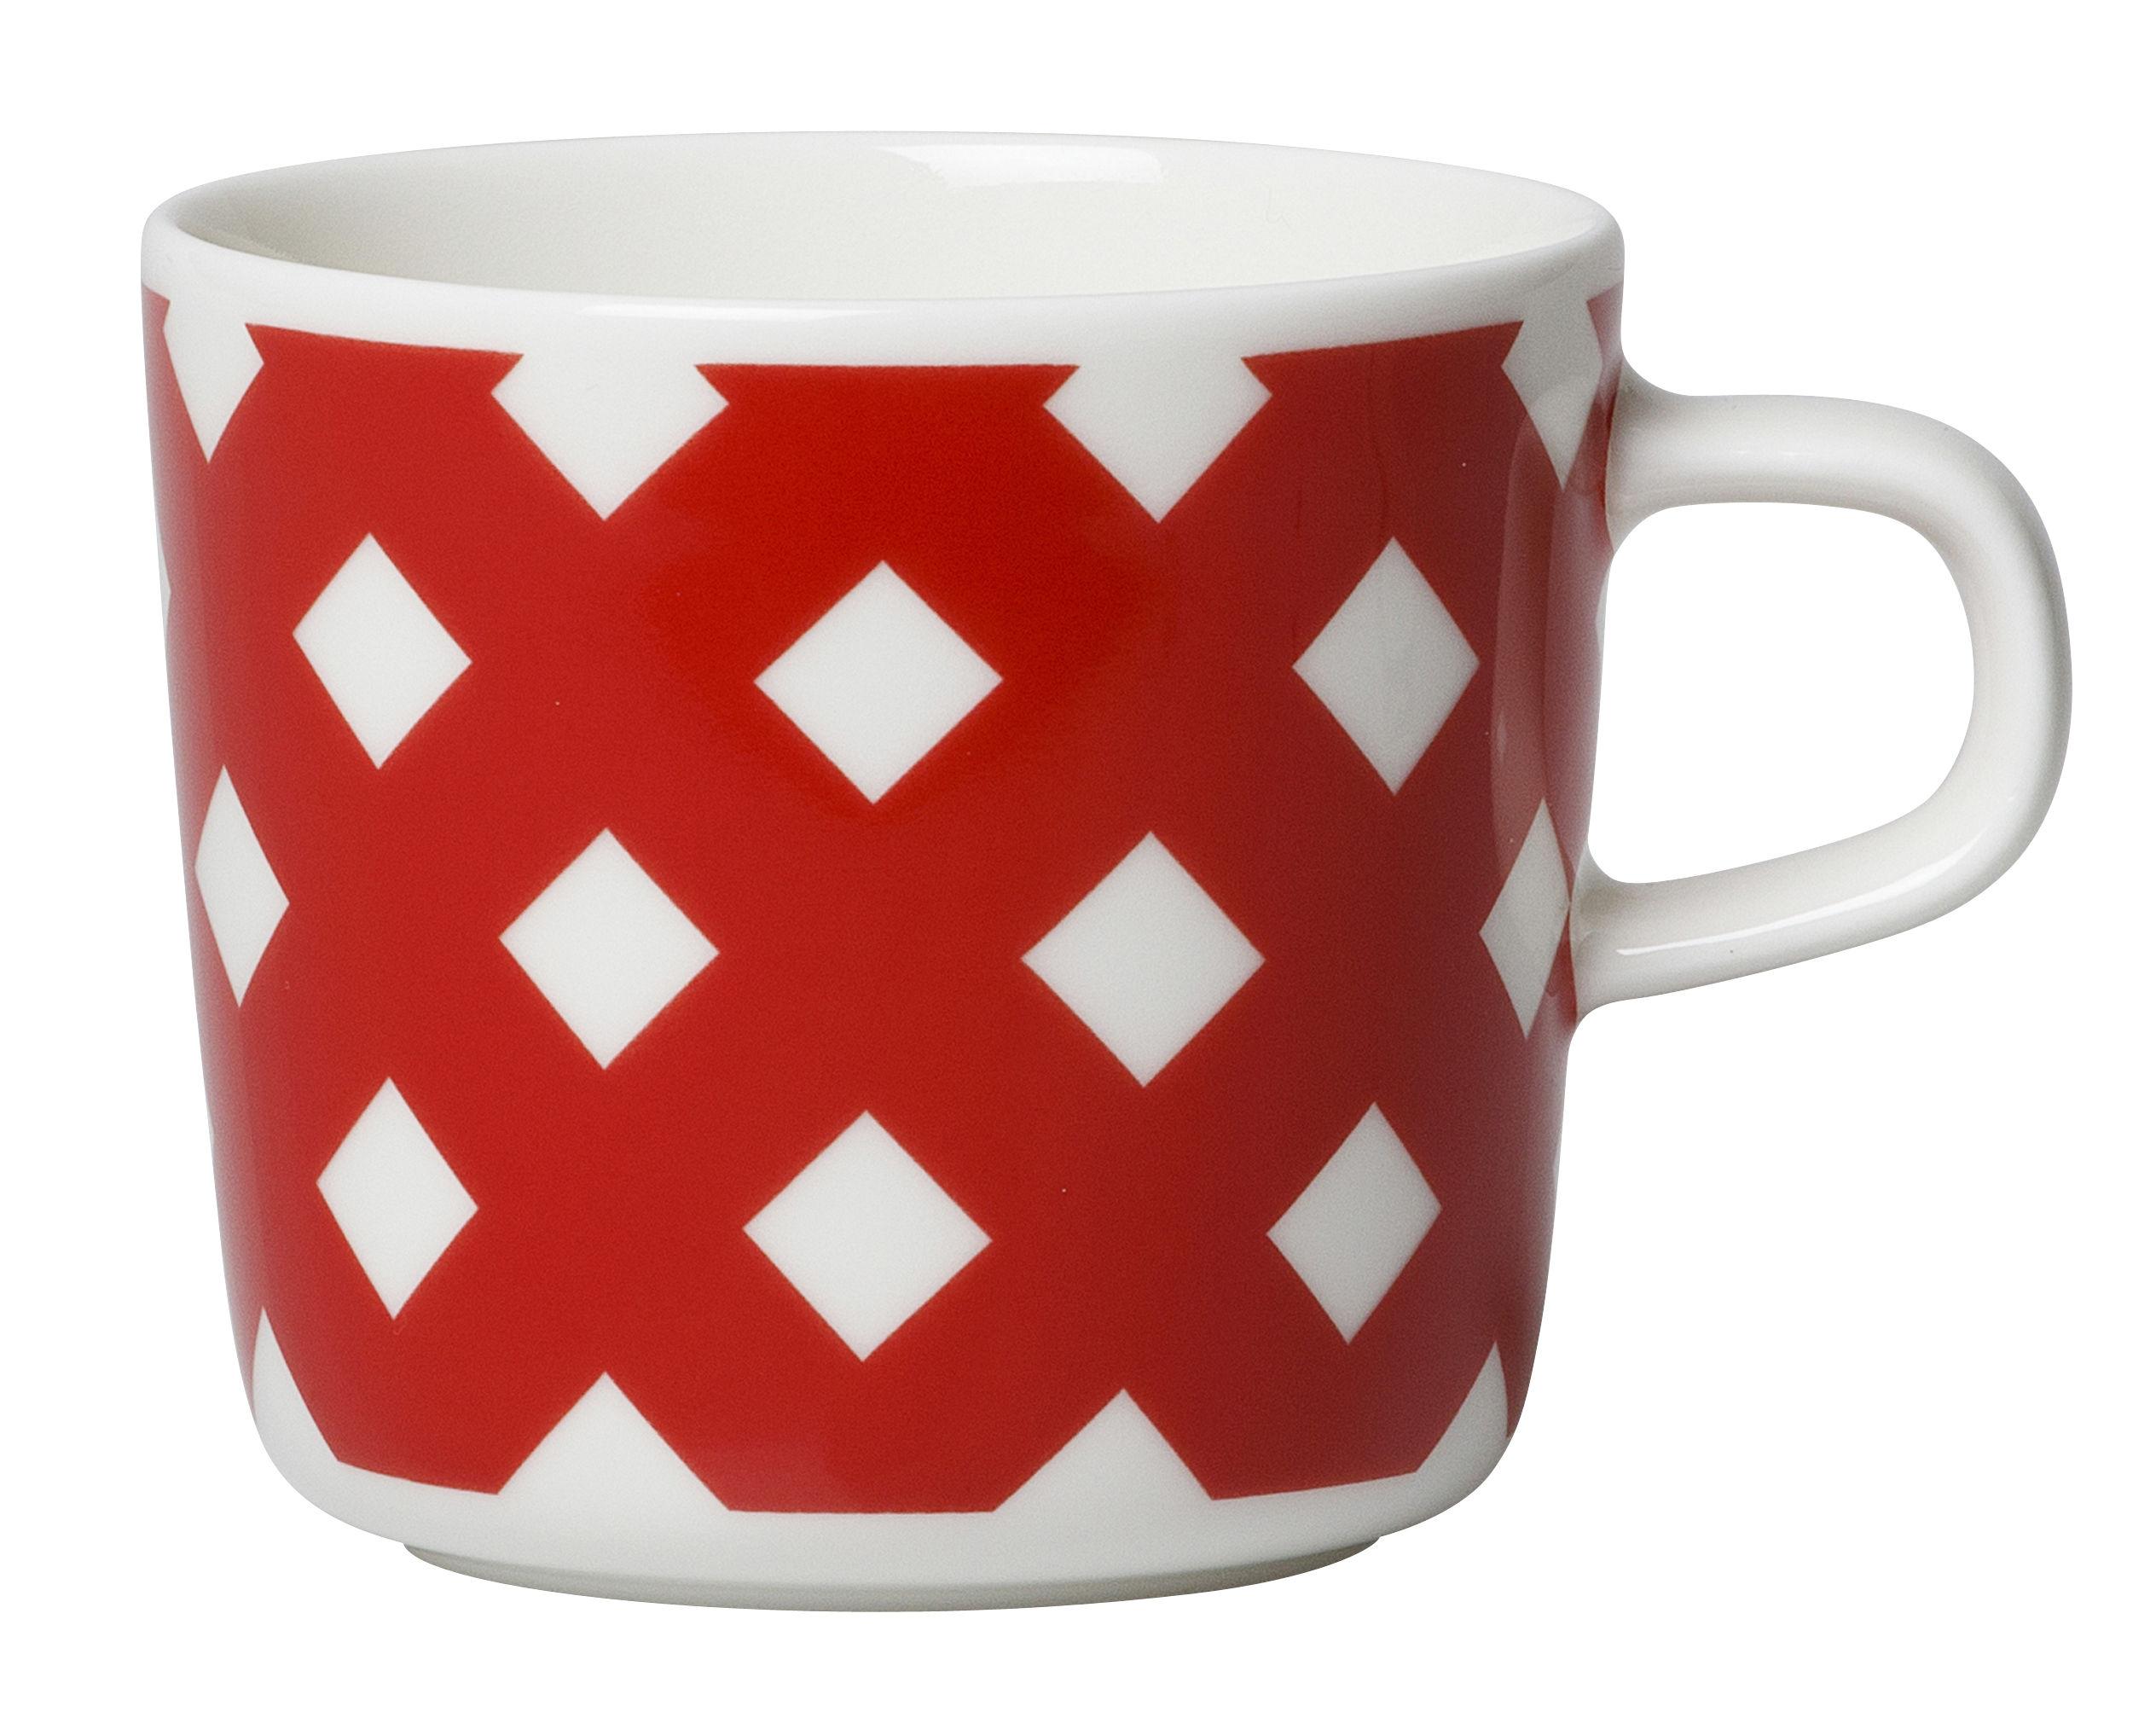 Tableware - Coffee Mugs & Tea Cups - Okko Coffee cup by Marimekko - Okko / White and red - Enamelled china